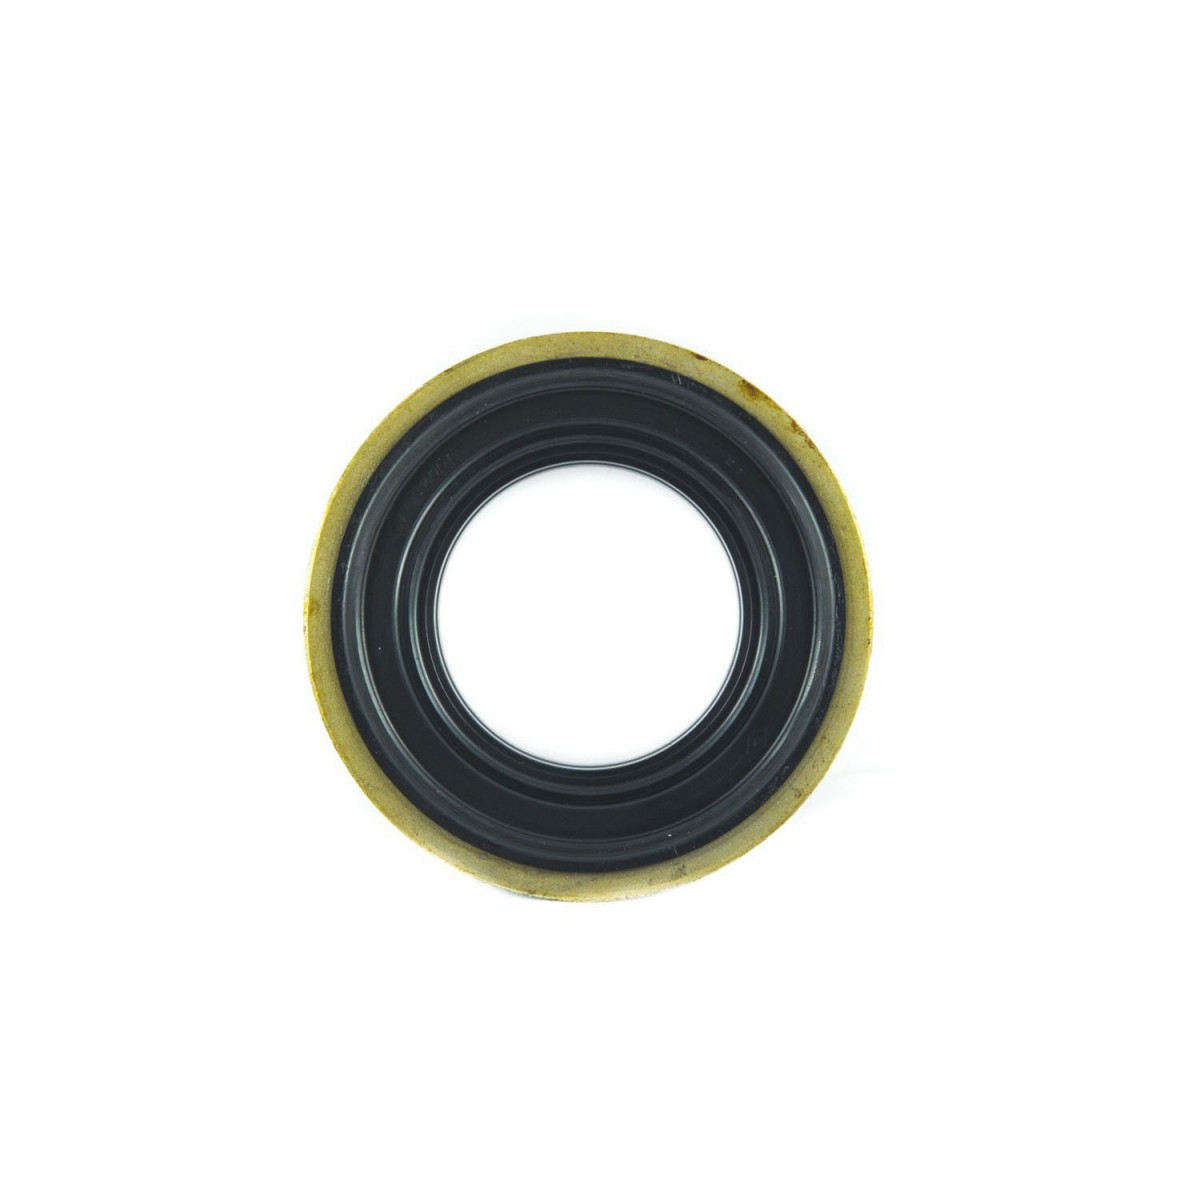 Hinterachskassette Dichtstoff 60-100-15/26 AQ3250E